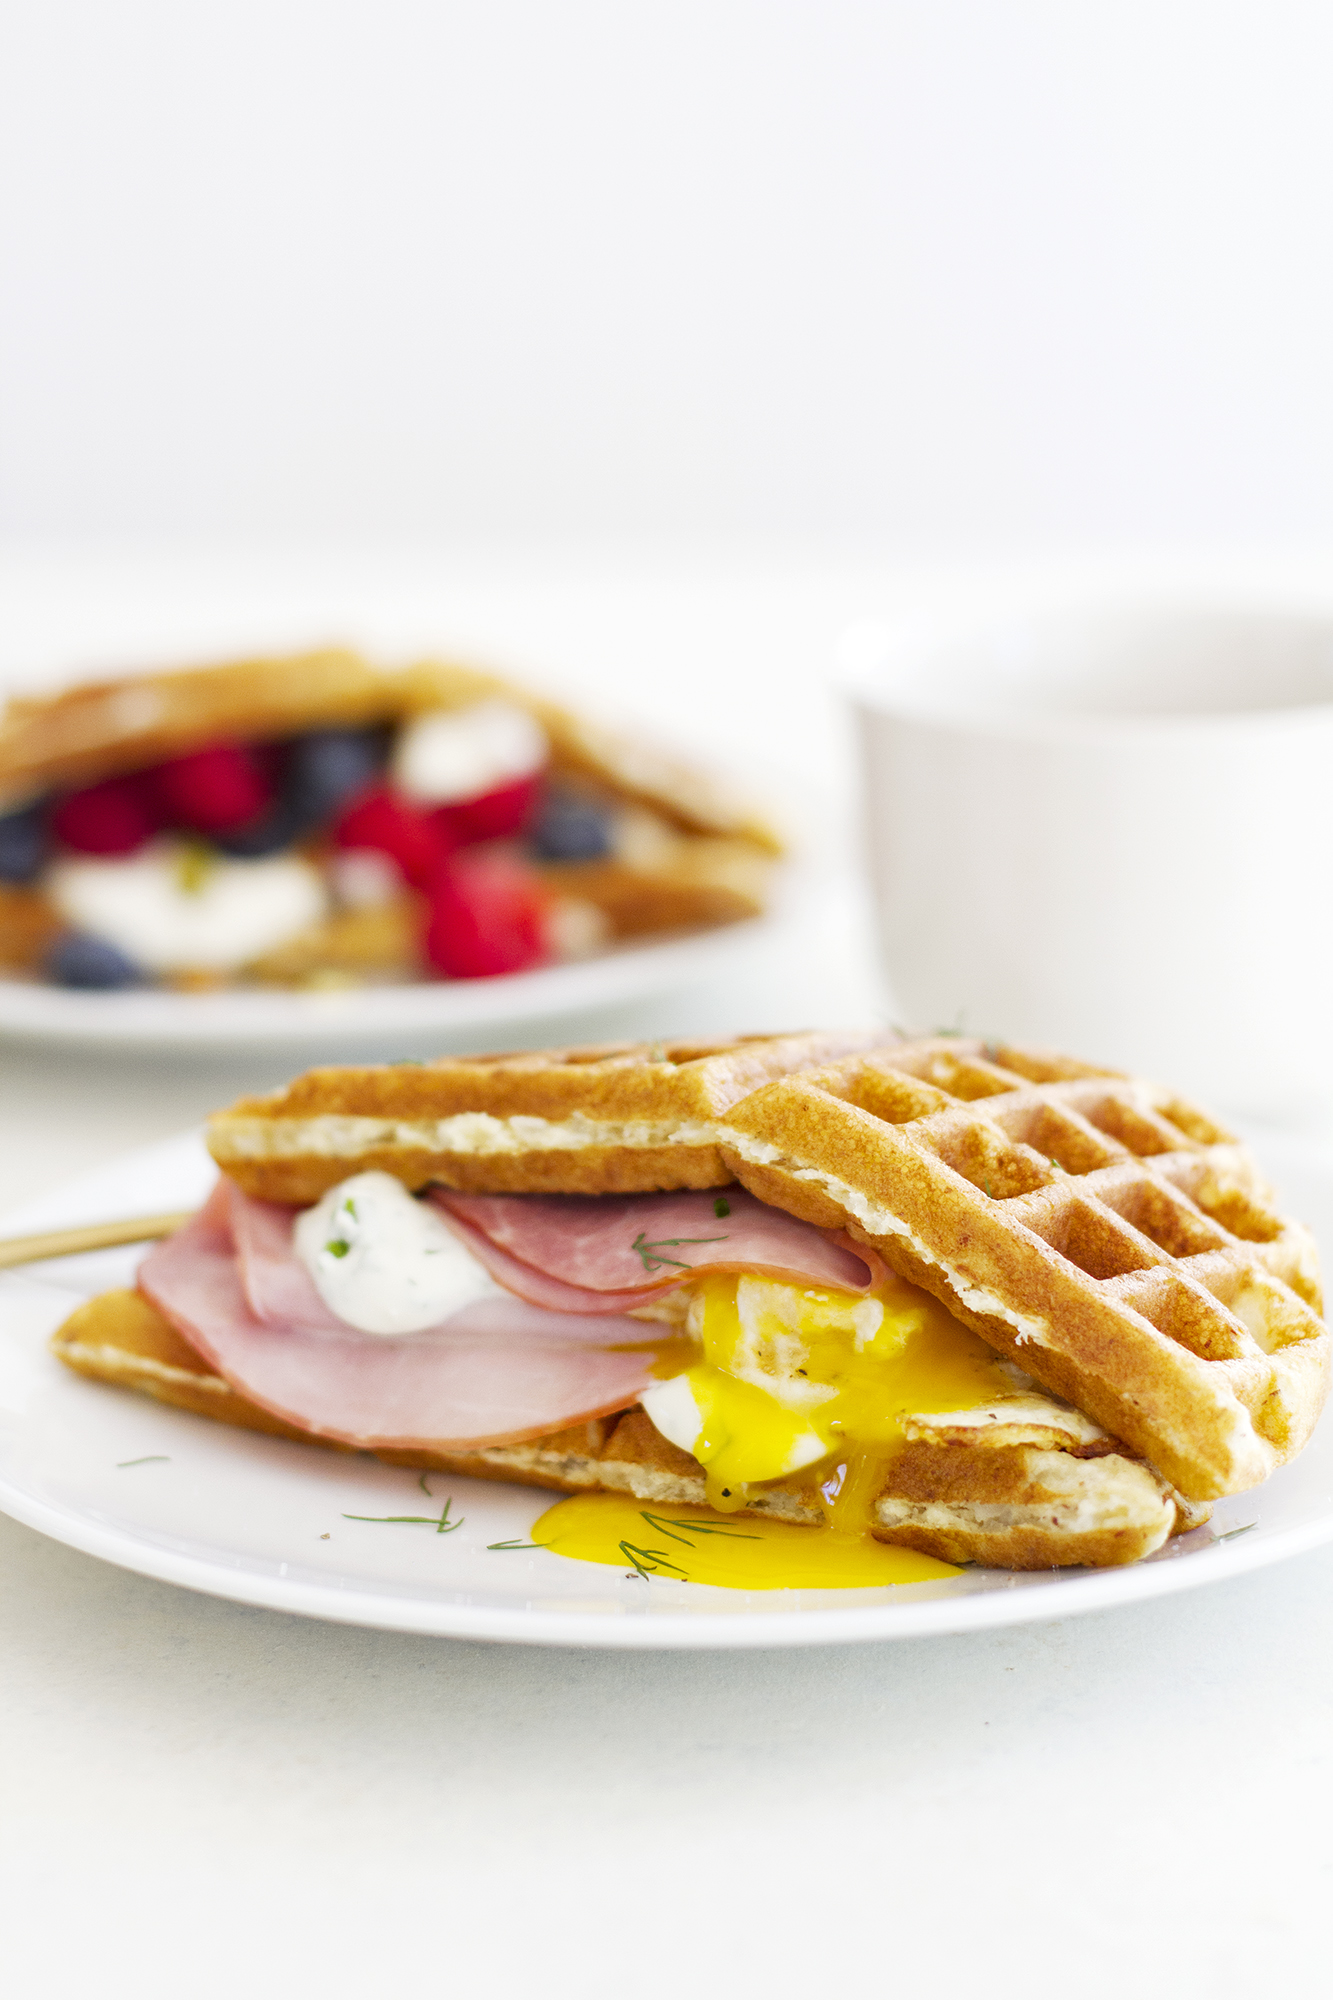 Sweet and Savory Gluten Free Waffle Breakfast Sandwiches | girlversusdough.com @girlversusdough